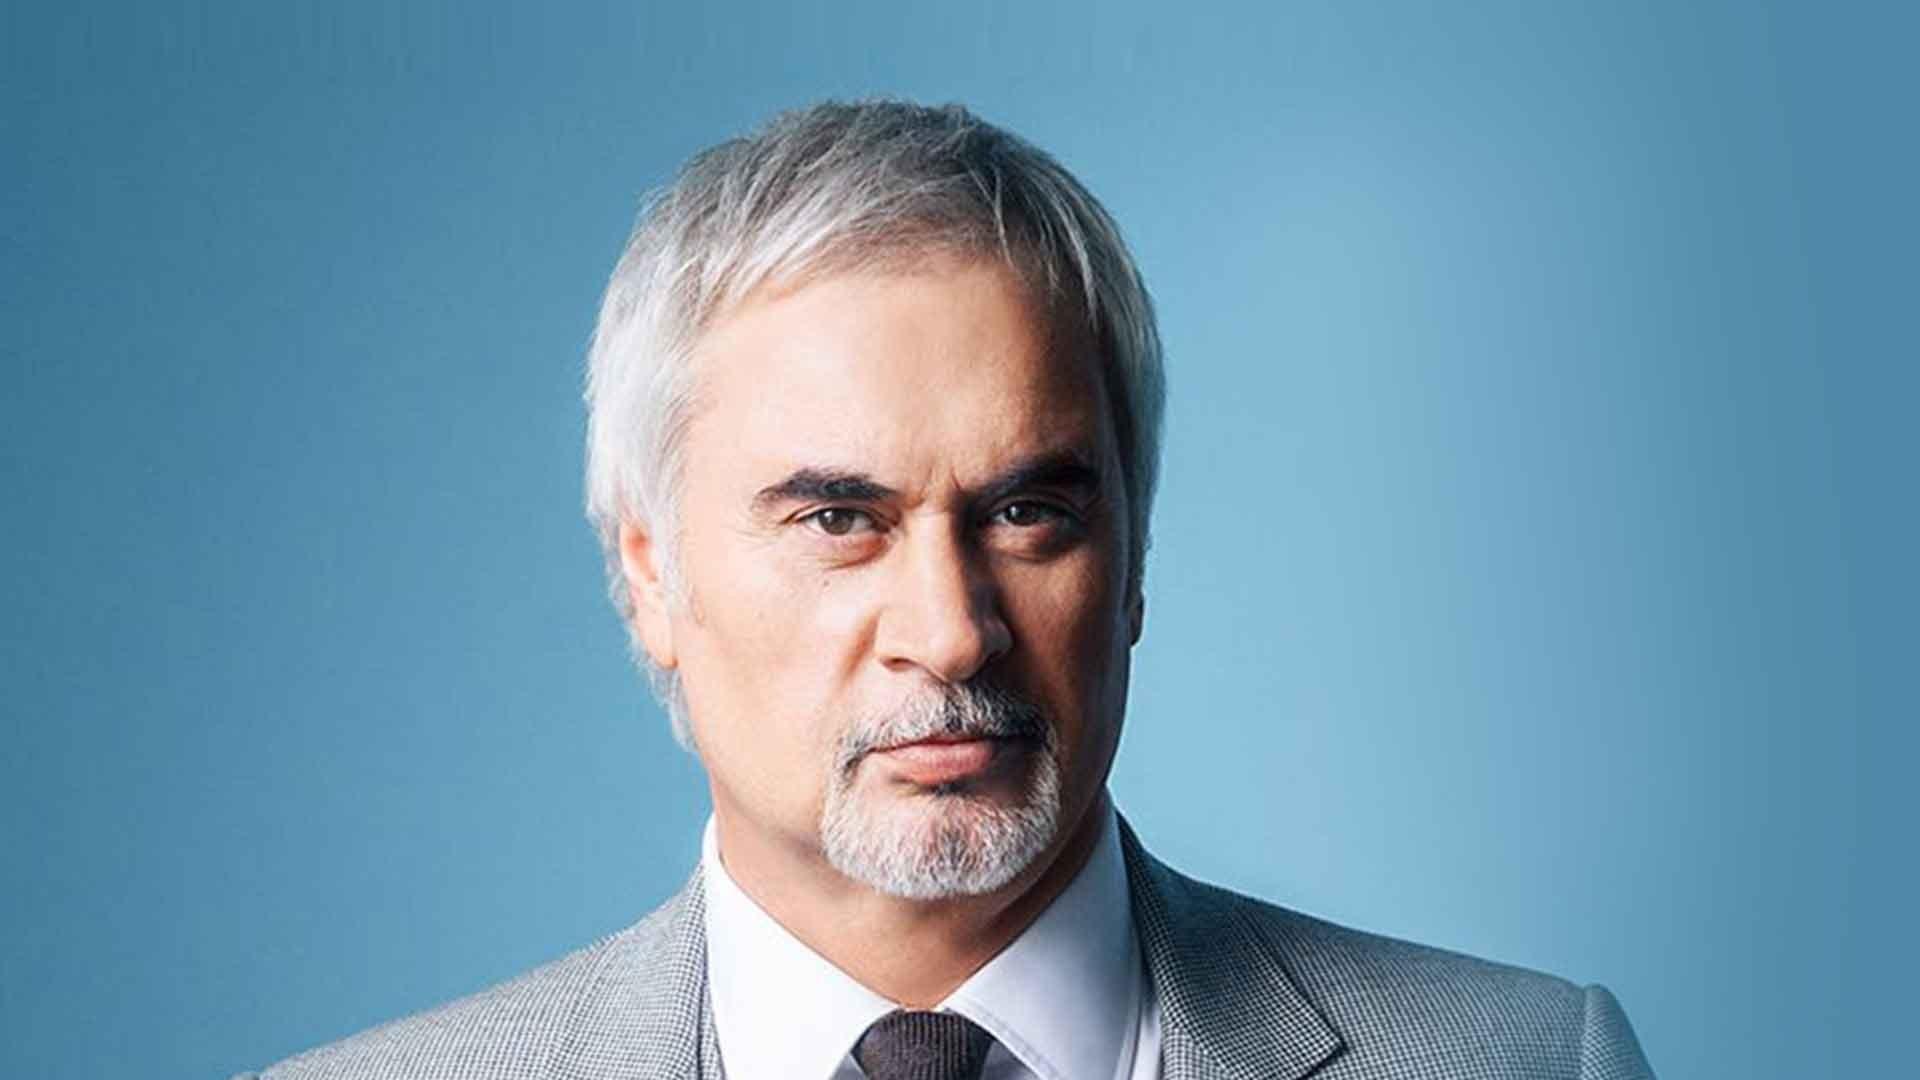 новокузнецк афиша кино сити молл новокузнецк официальный сайт цены